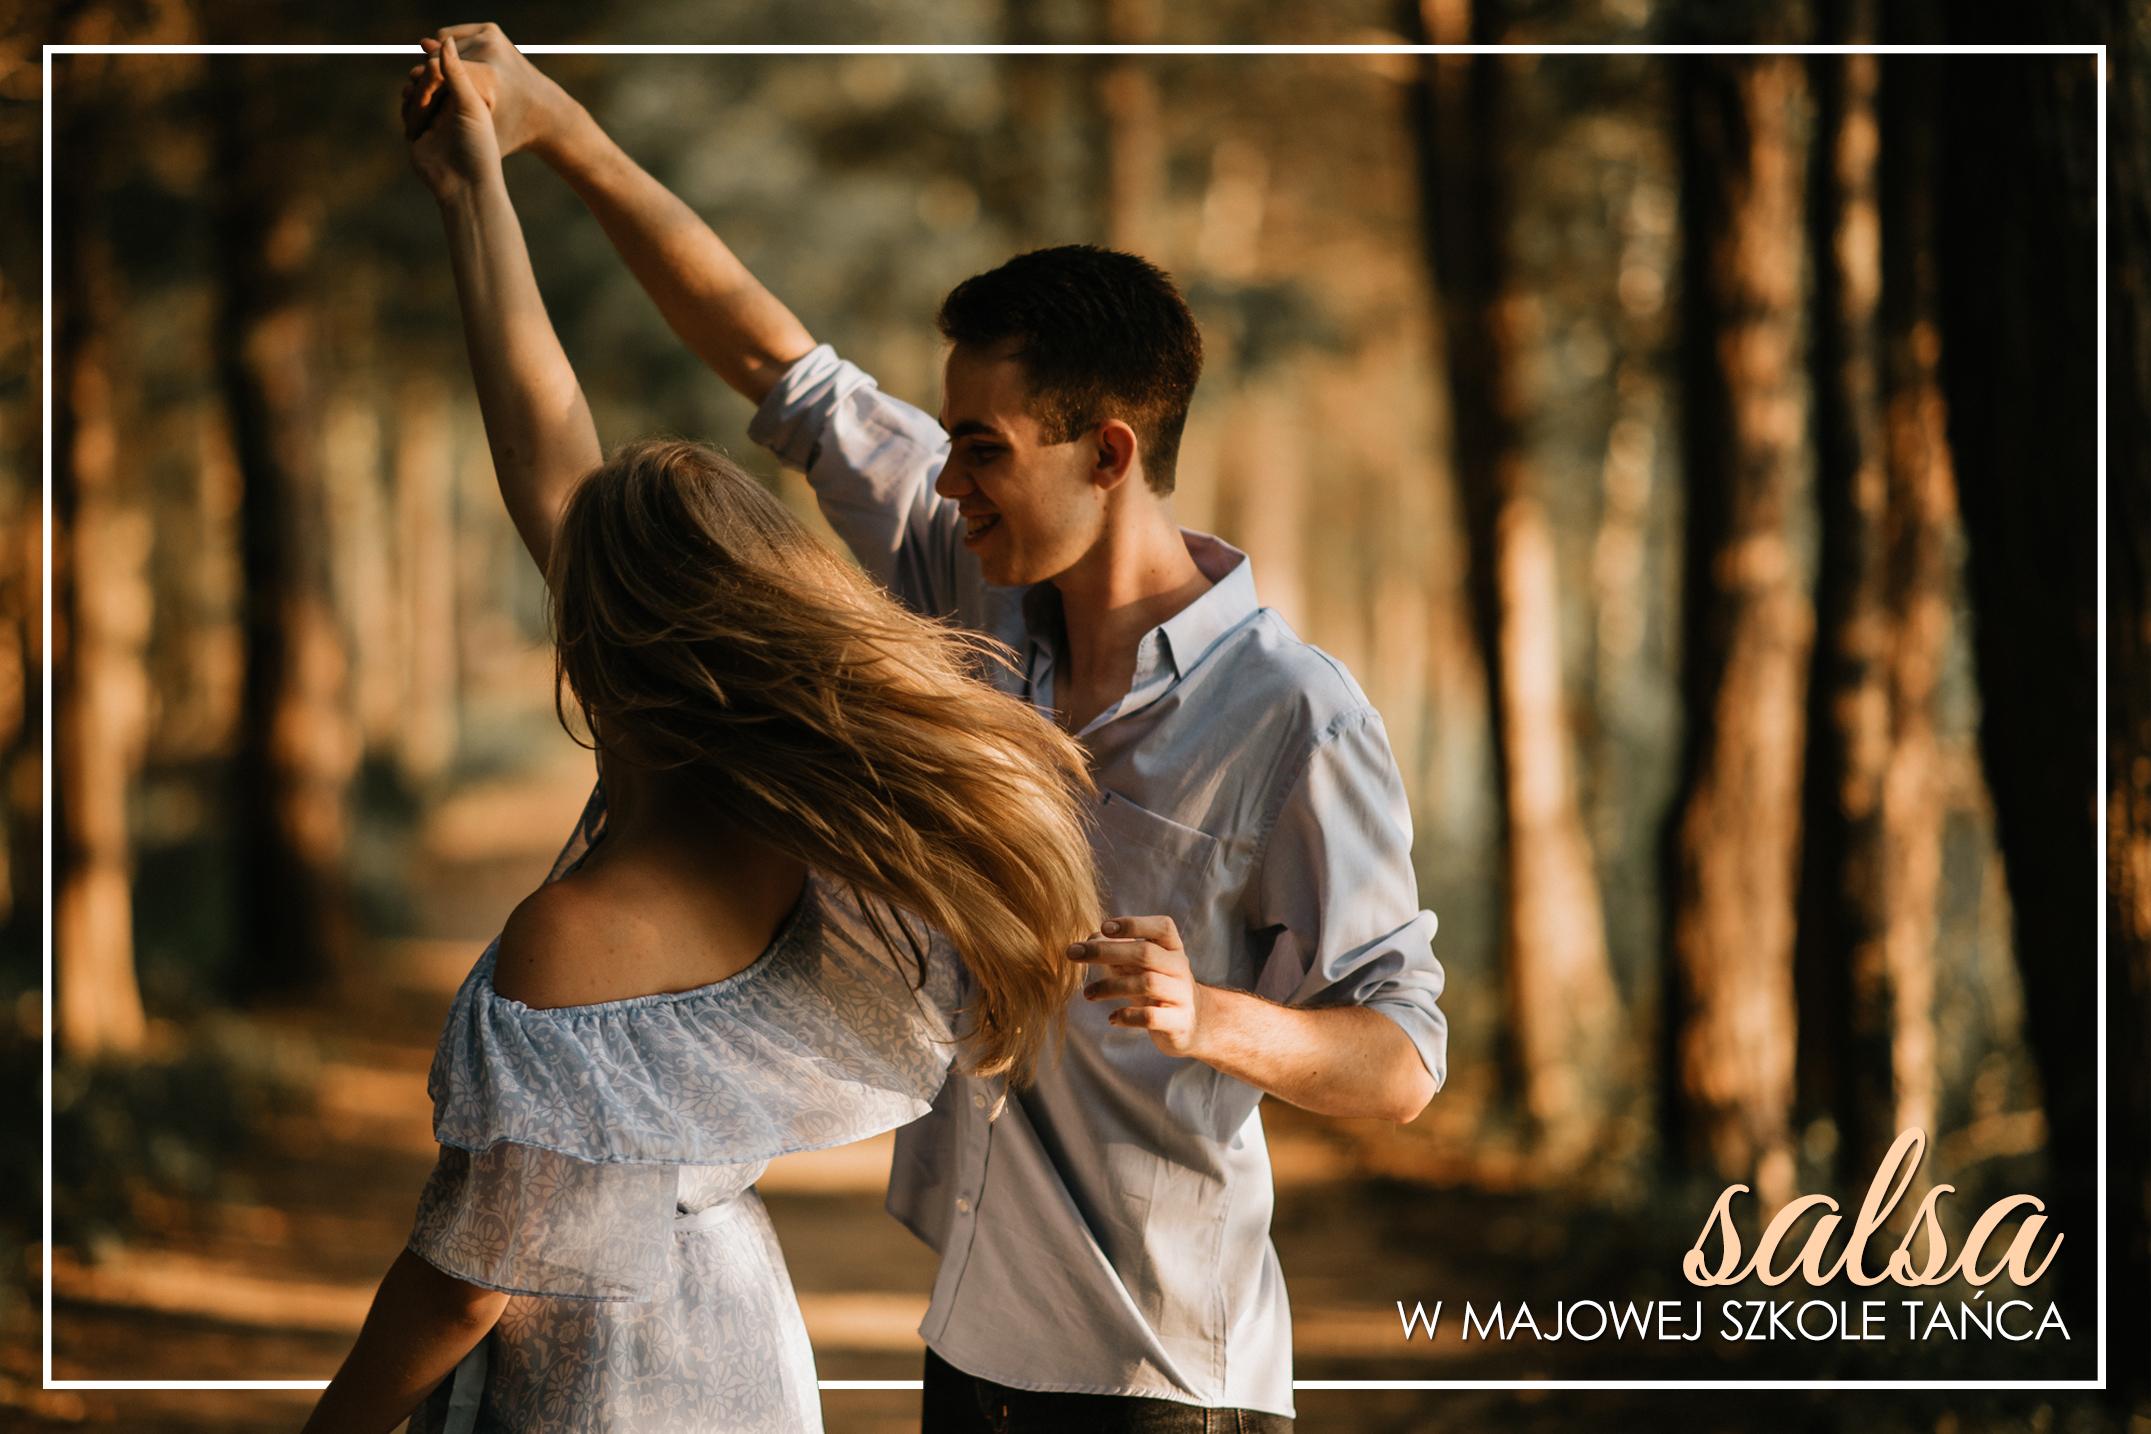 Salsa, kurs tańca, taniec